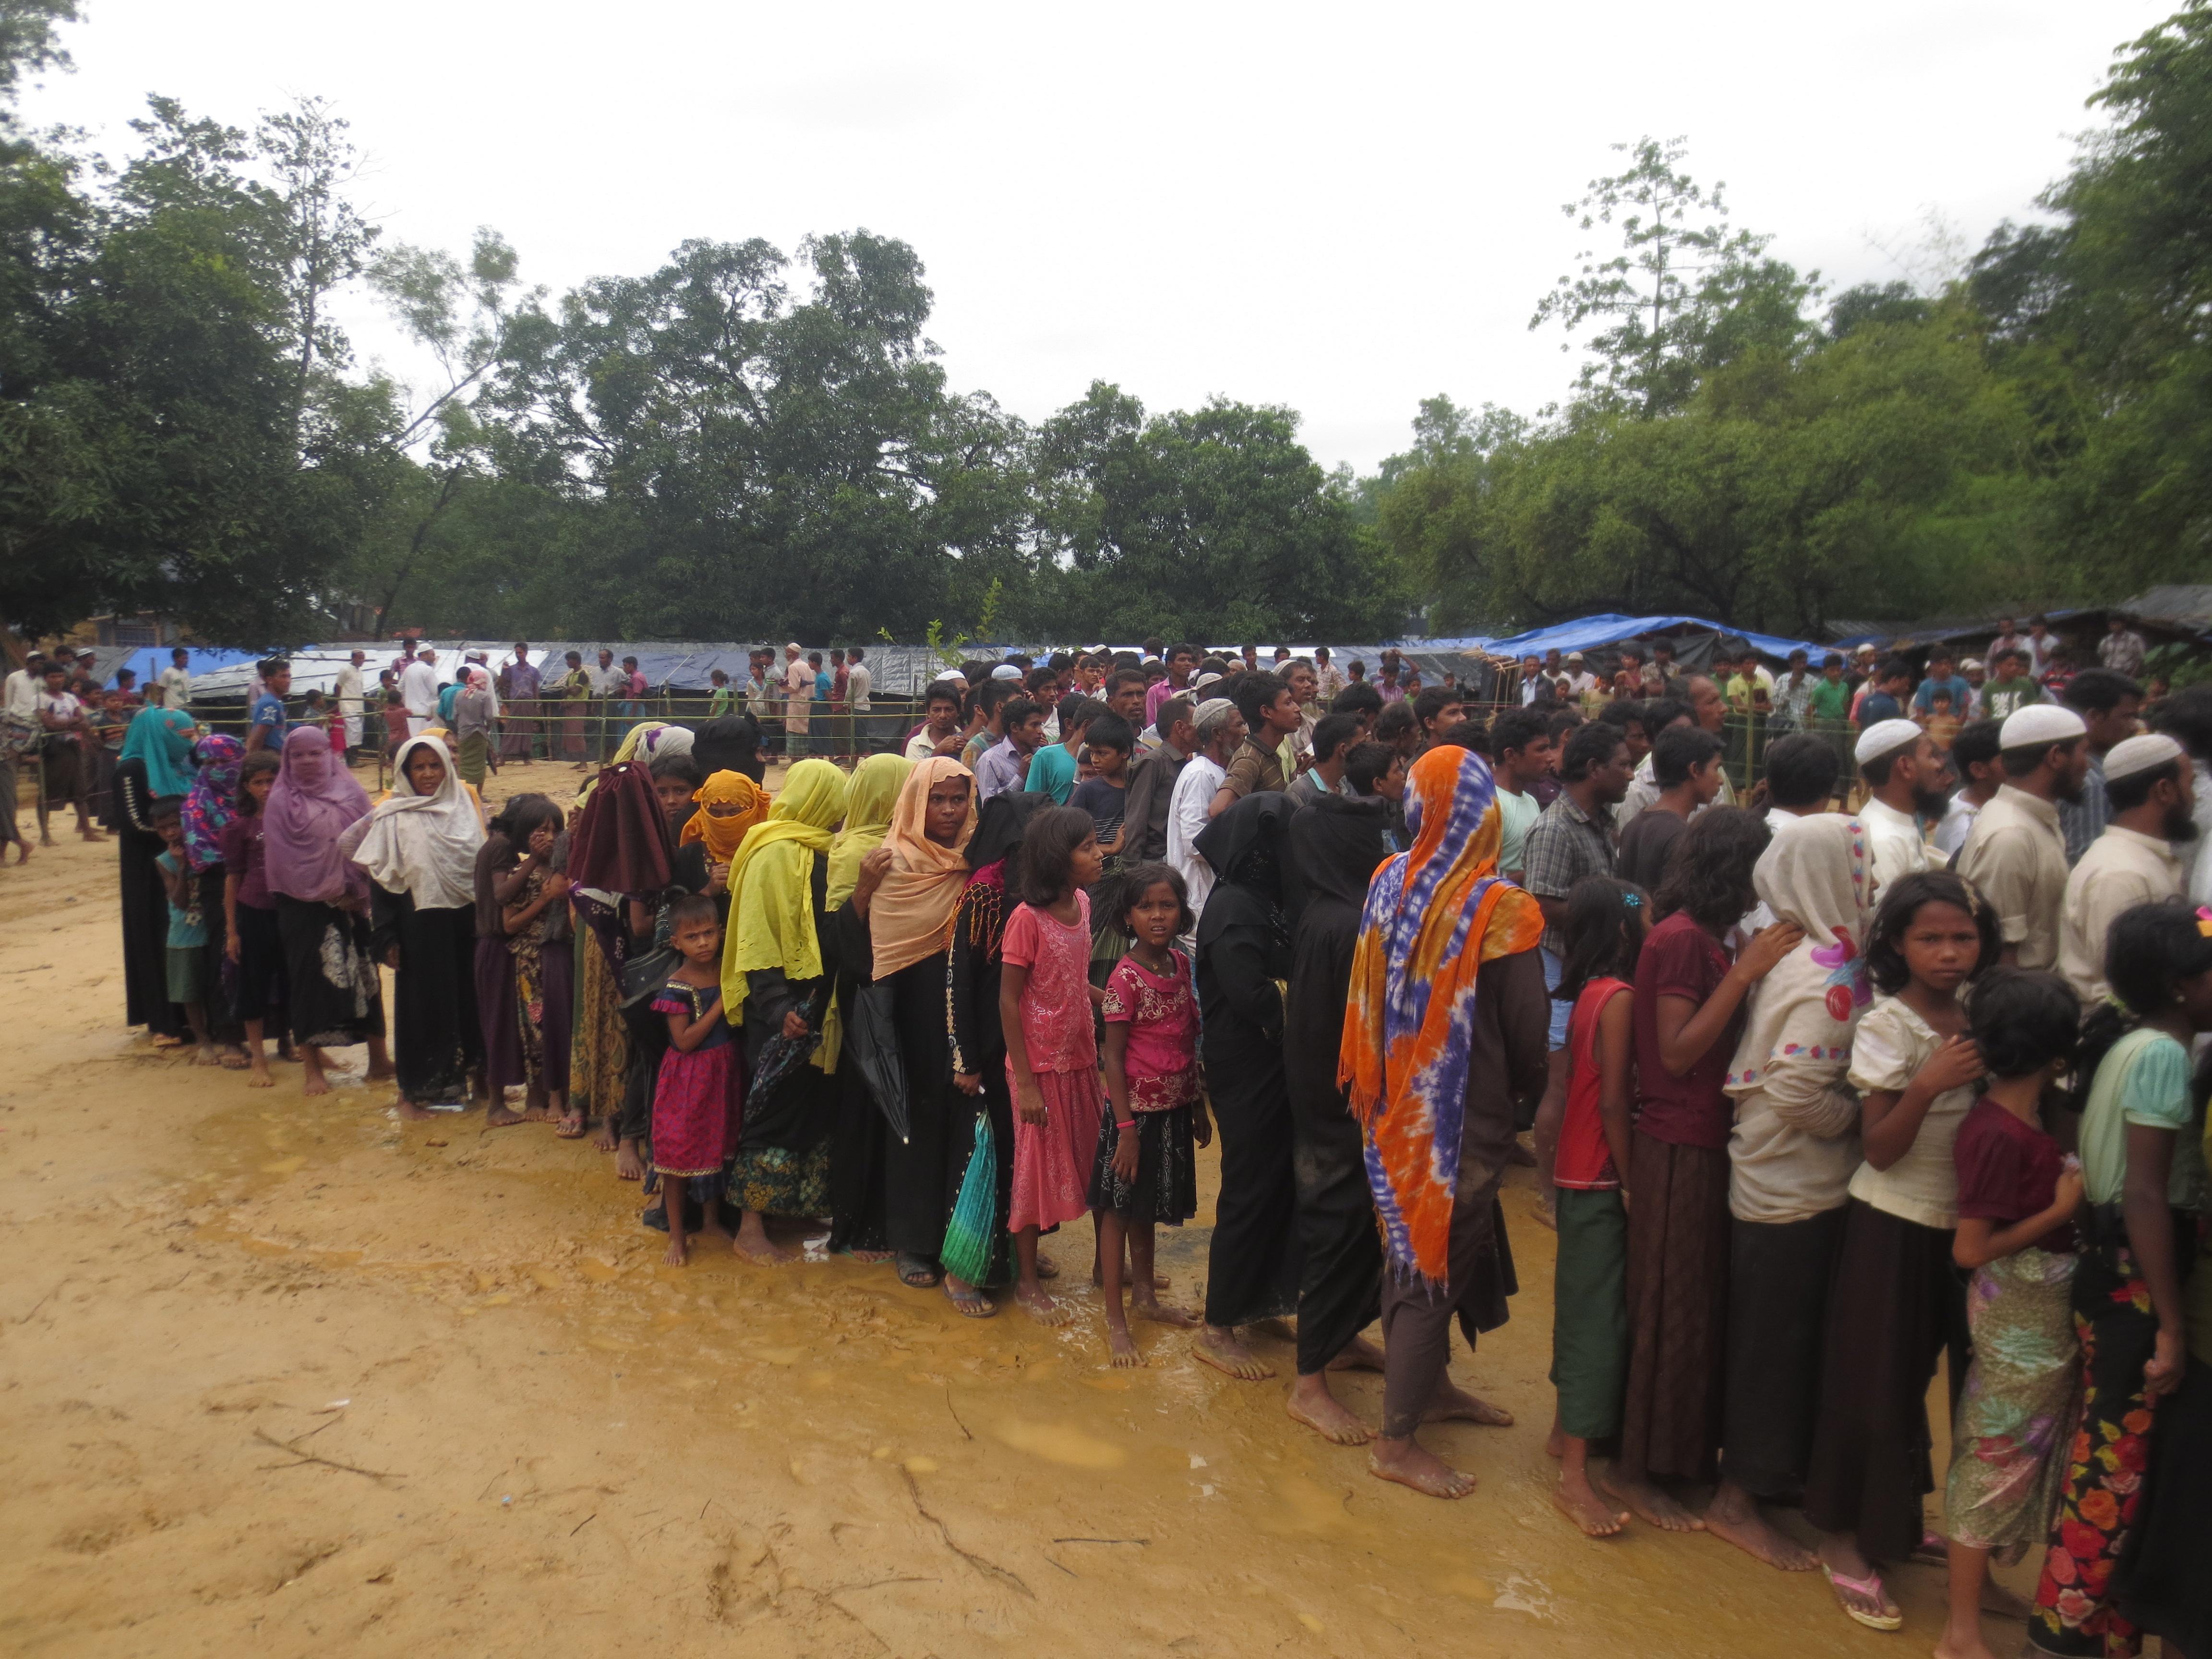 Hundreds of Rohingya refugees moved to an island